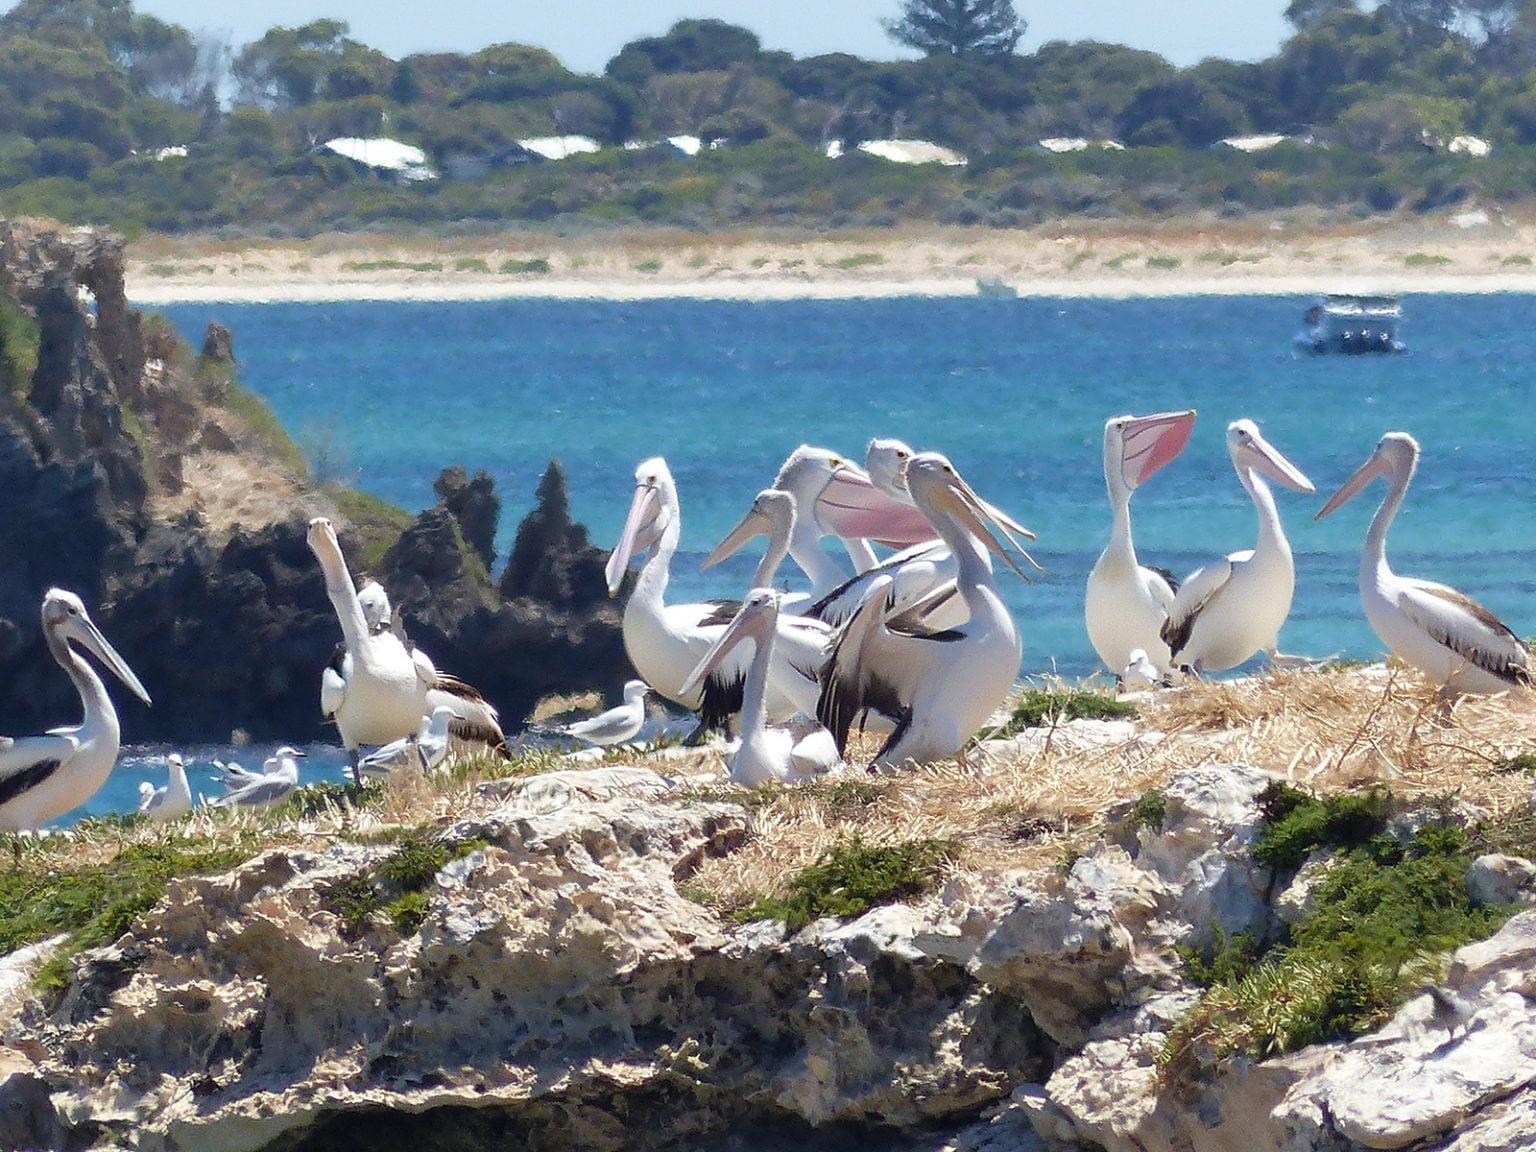 Pelicans on the beach, Western Australia